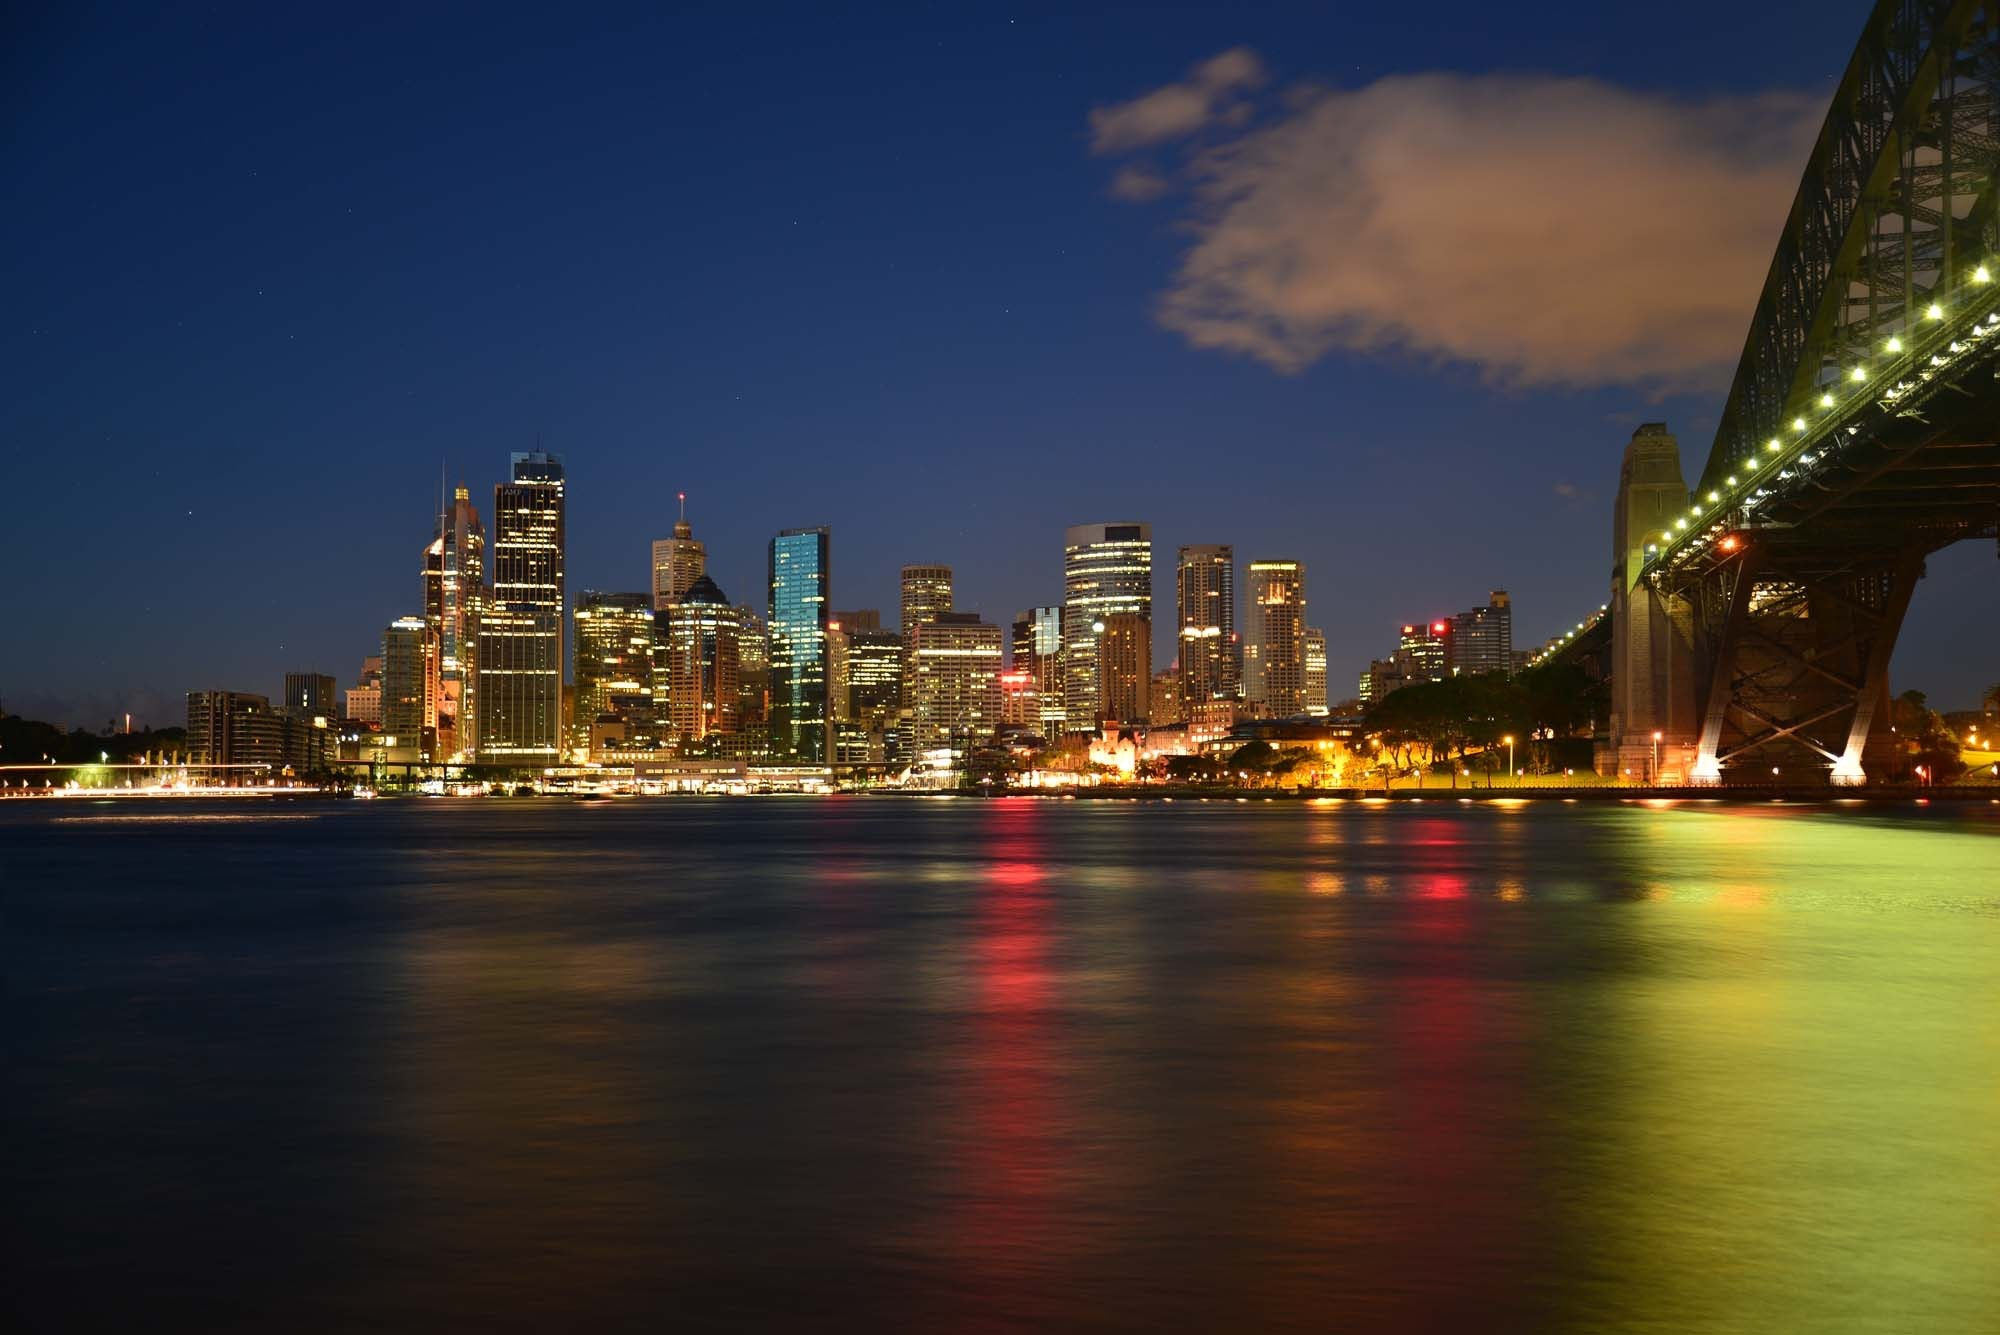 Panoramic Photography of Metropolis Next to Bridge during Night Time, Australia, Reflection, Urban, Twilight, HQ Photo